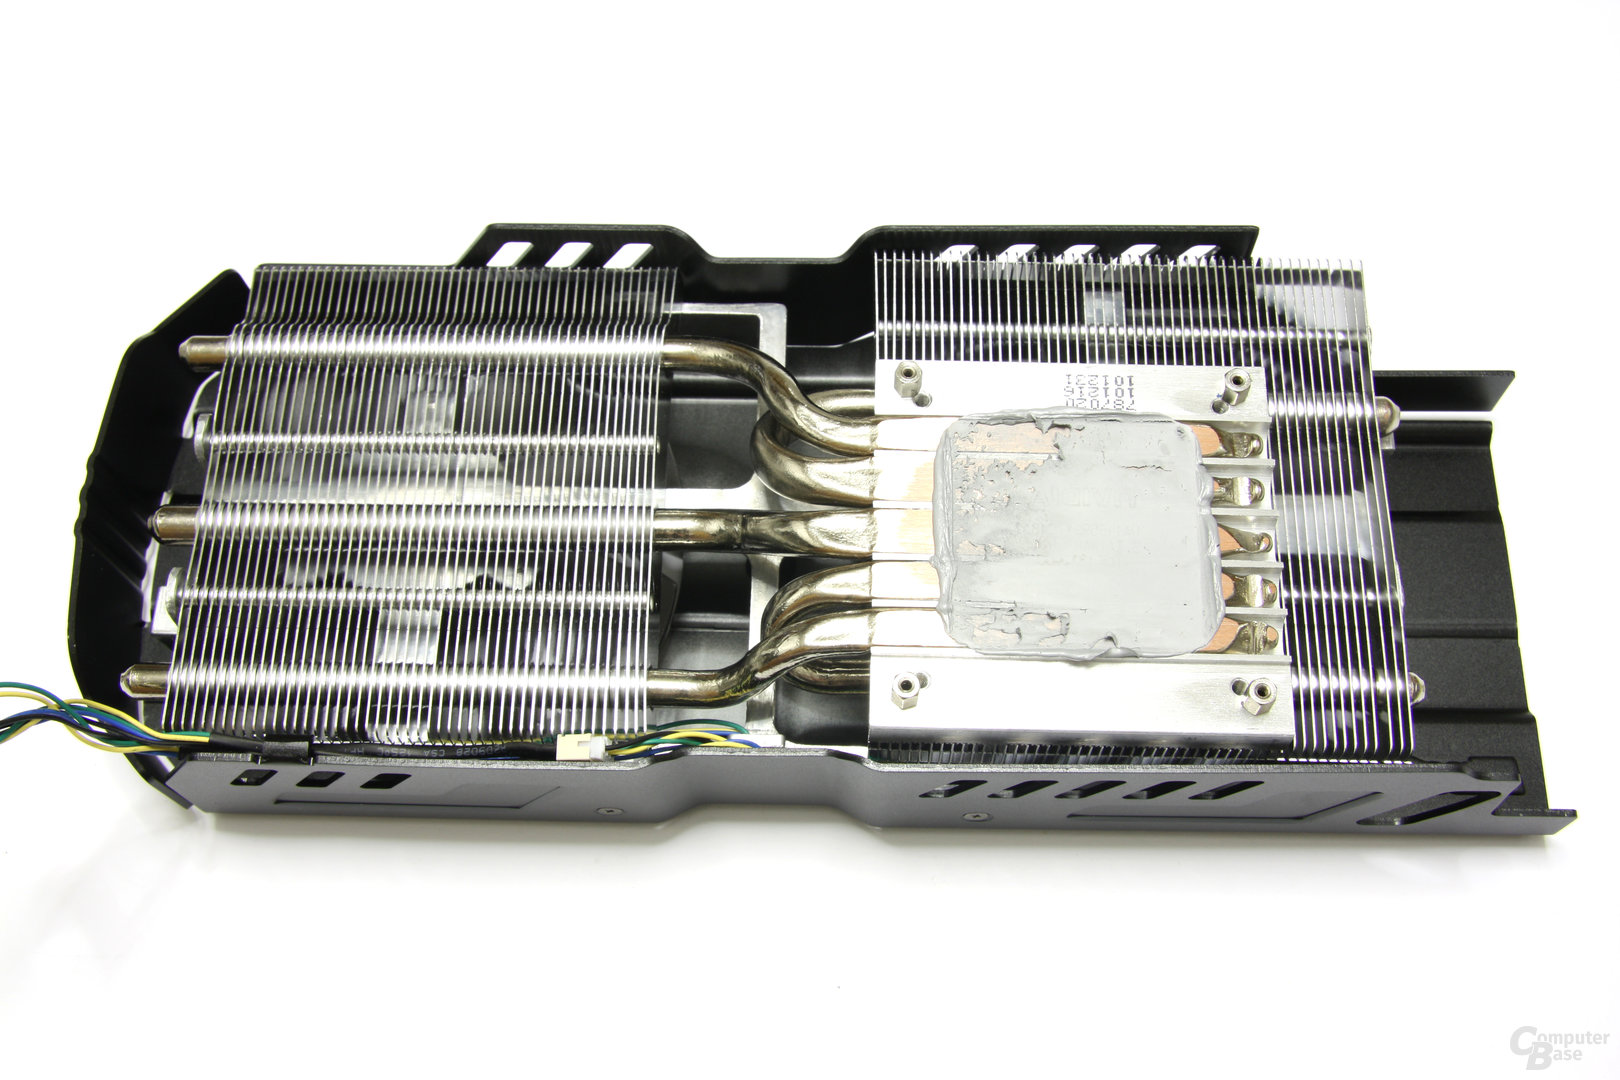 GeForce GTX 570 DirectCU II Kühlerrückseite